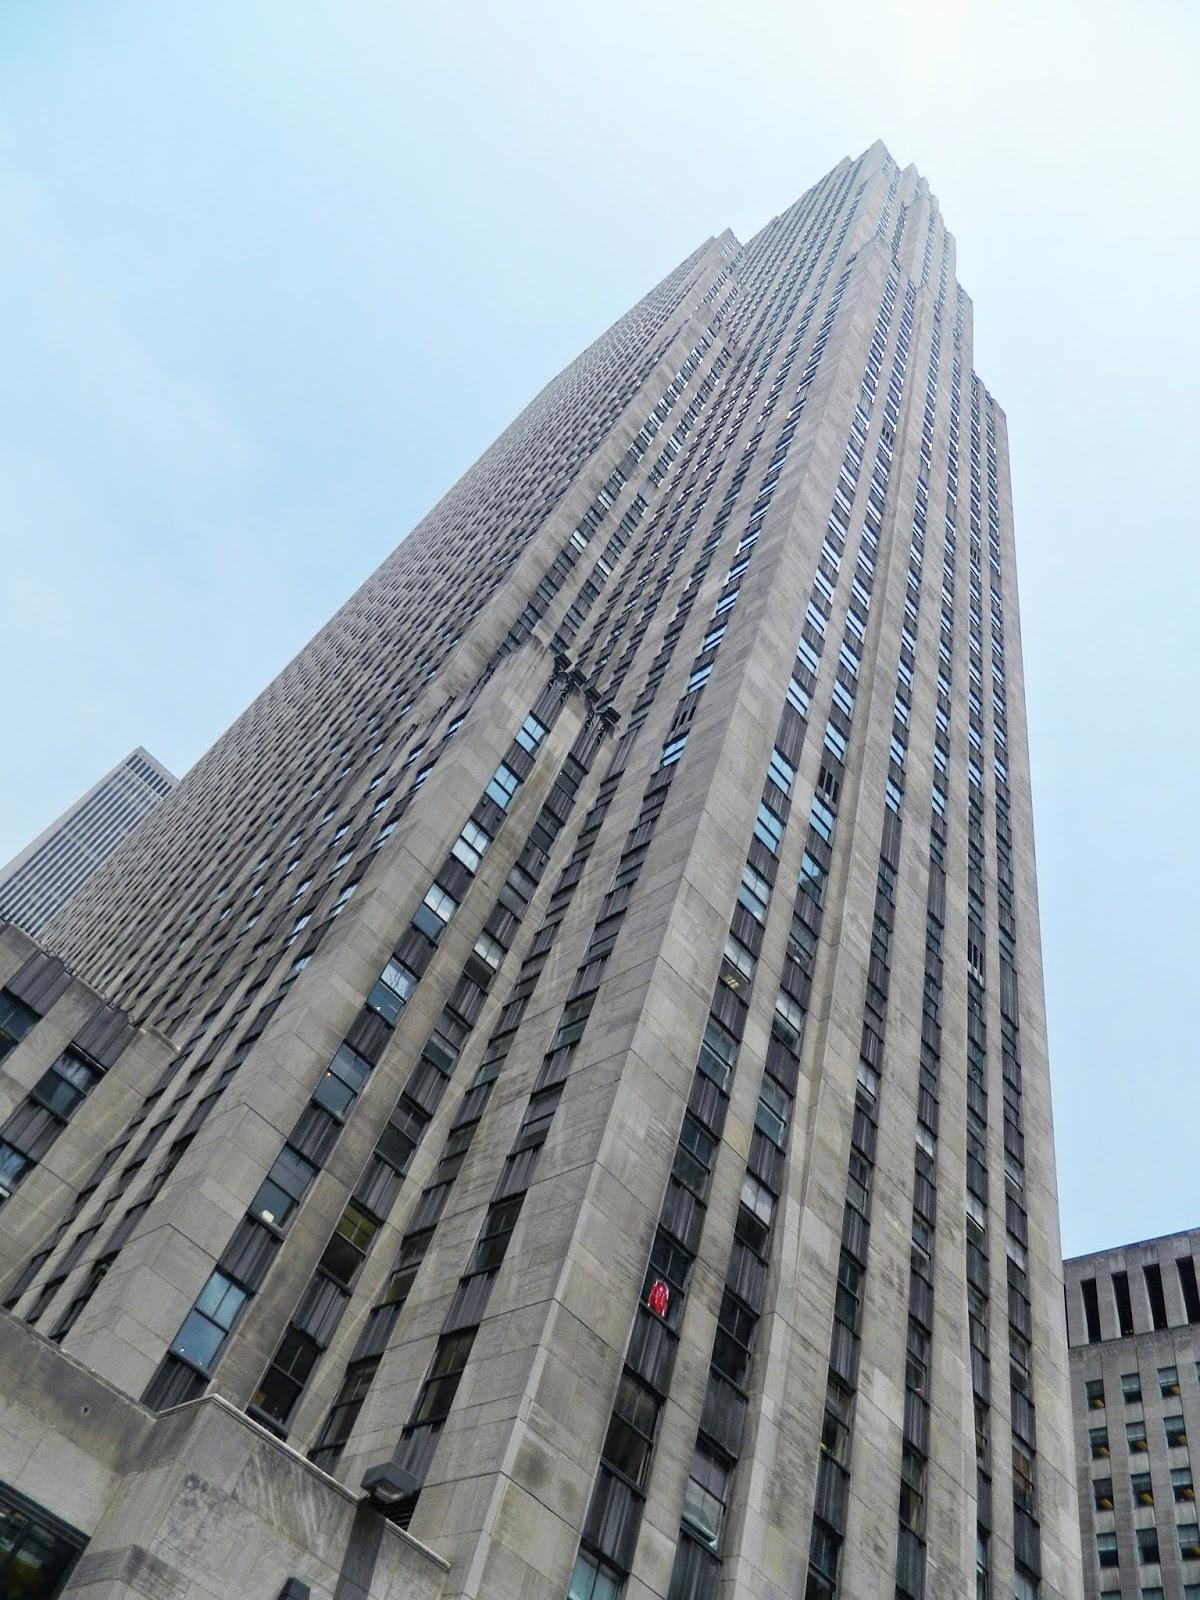 new york city Rockefeller Center architecture high tall sky sunny